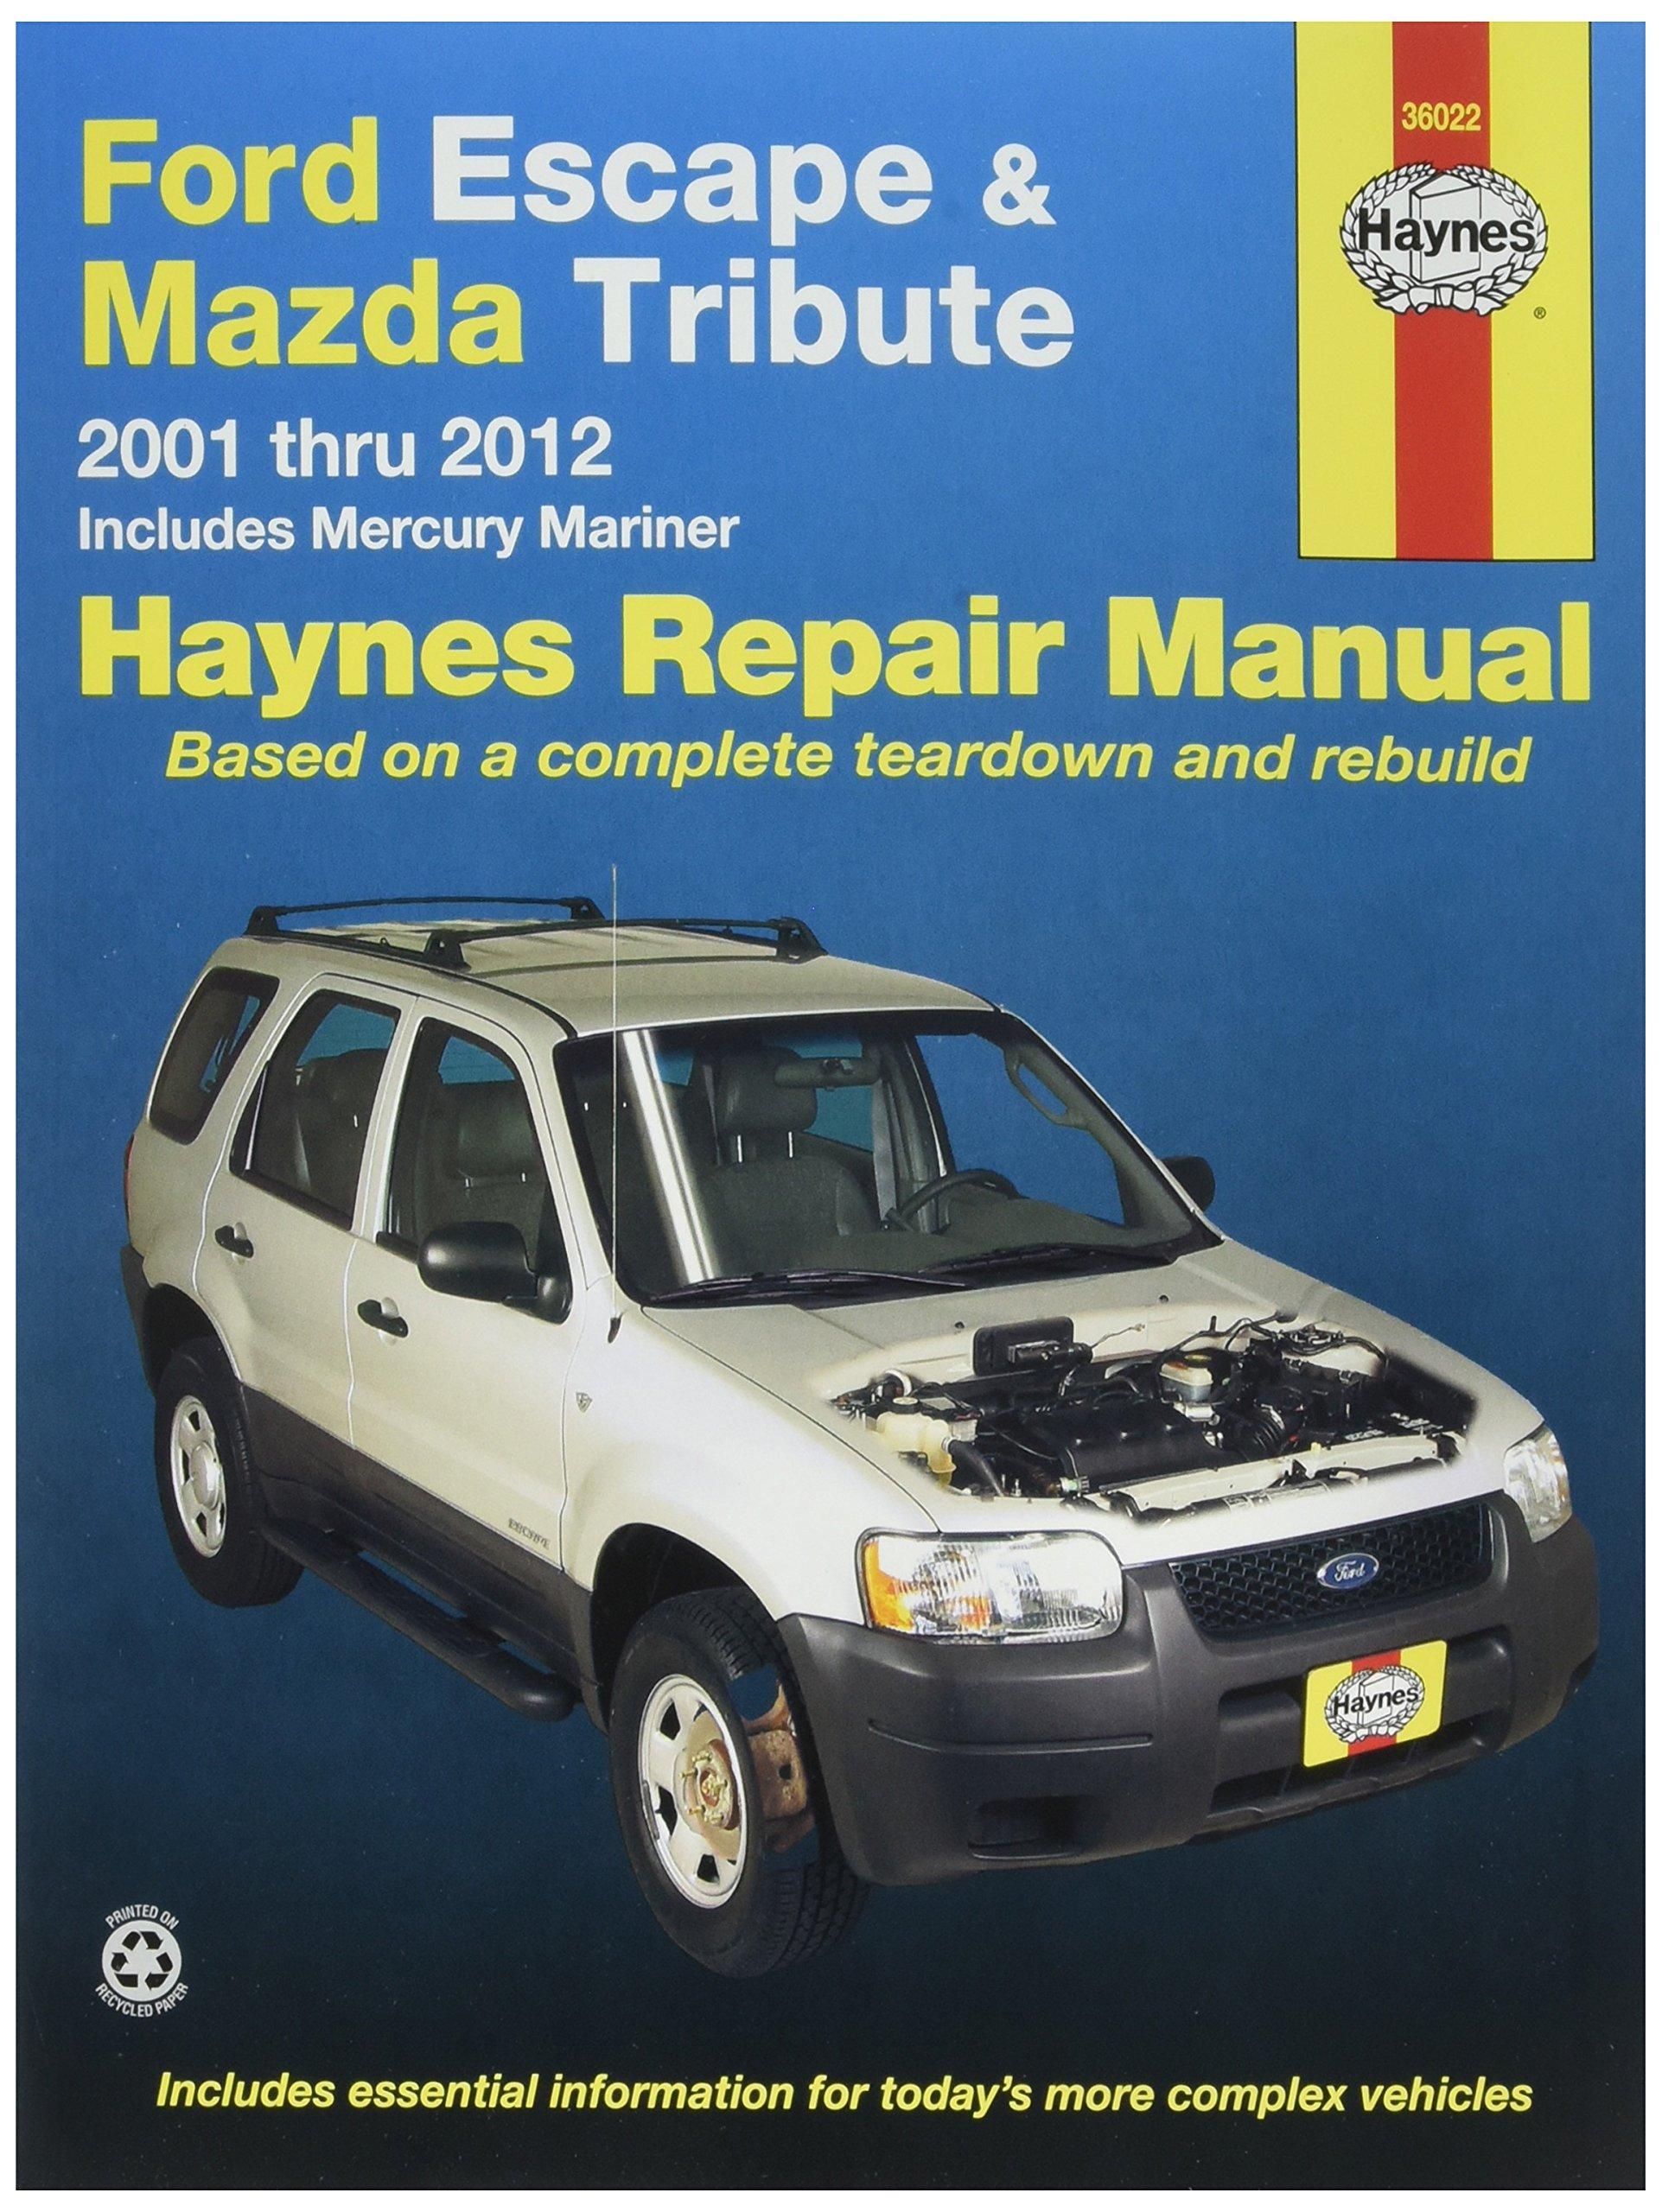 Amazon.com: Haynes Publications, Inc. 36022 Repair Manual (0038345360220):  Books